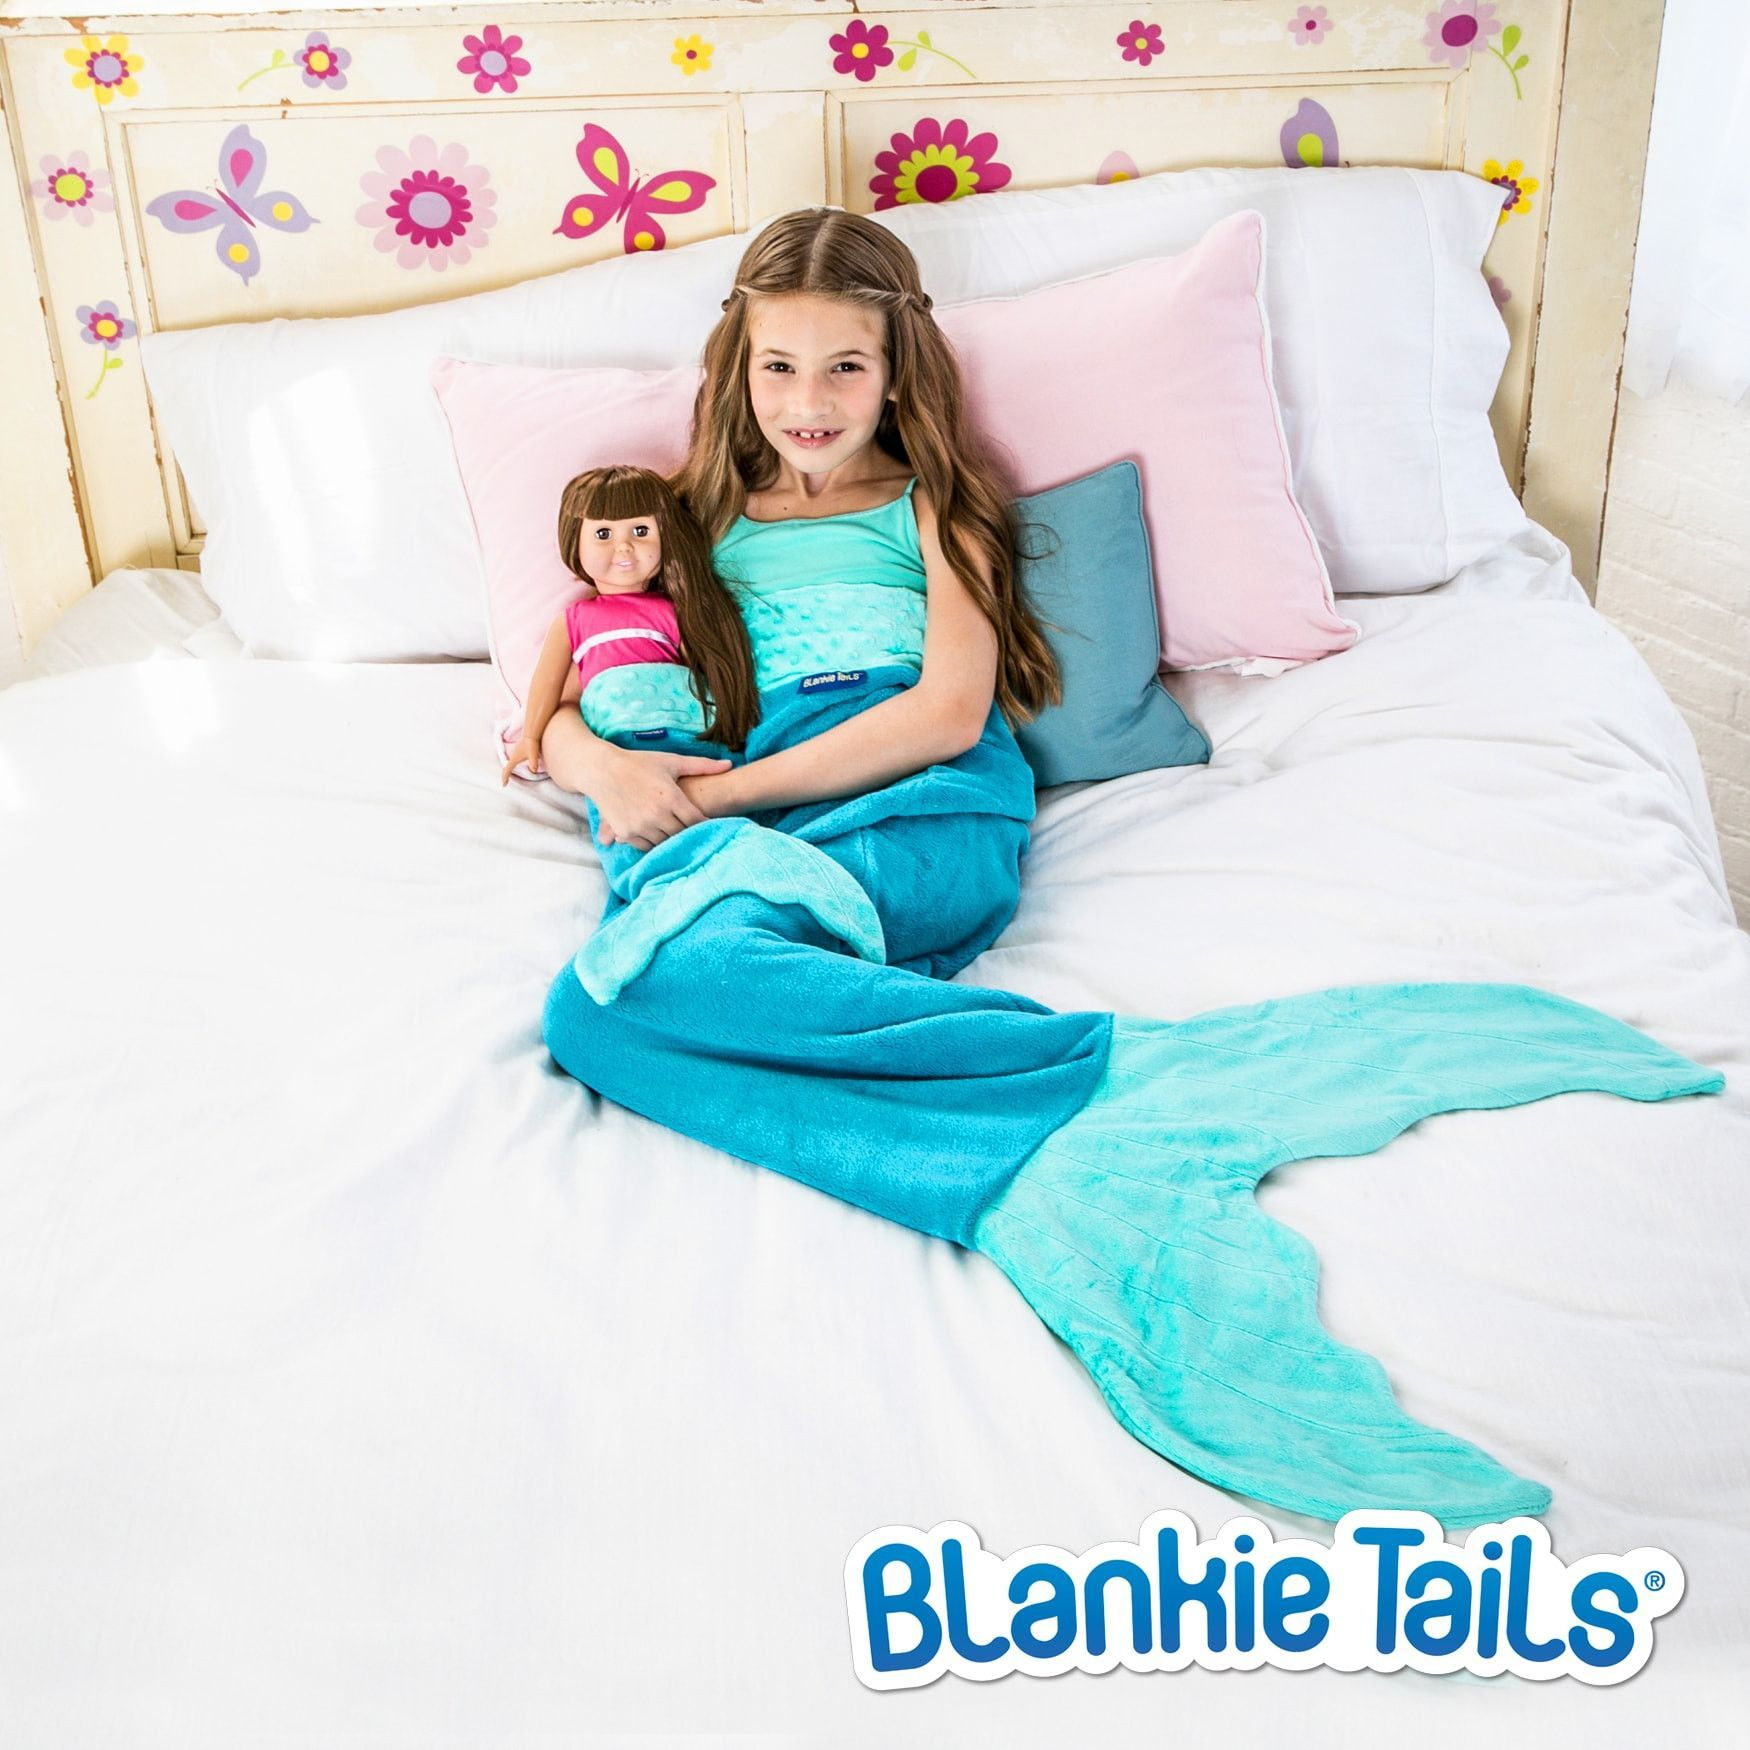 Mermaid Tail Blanket For Kids Classic Design In 2 Fintastic